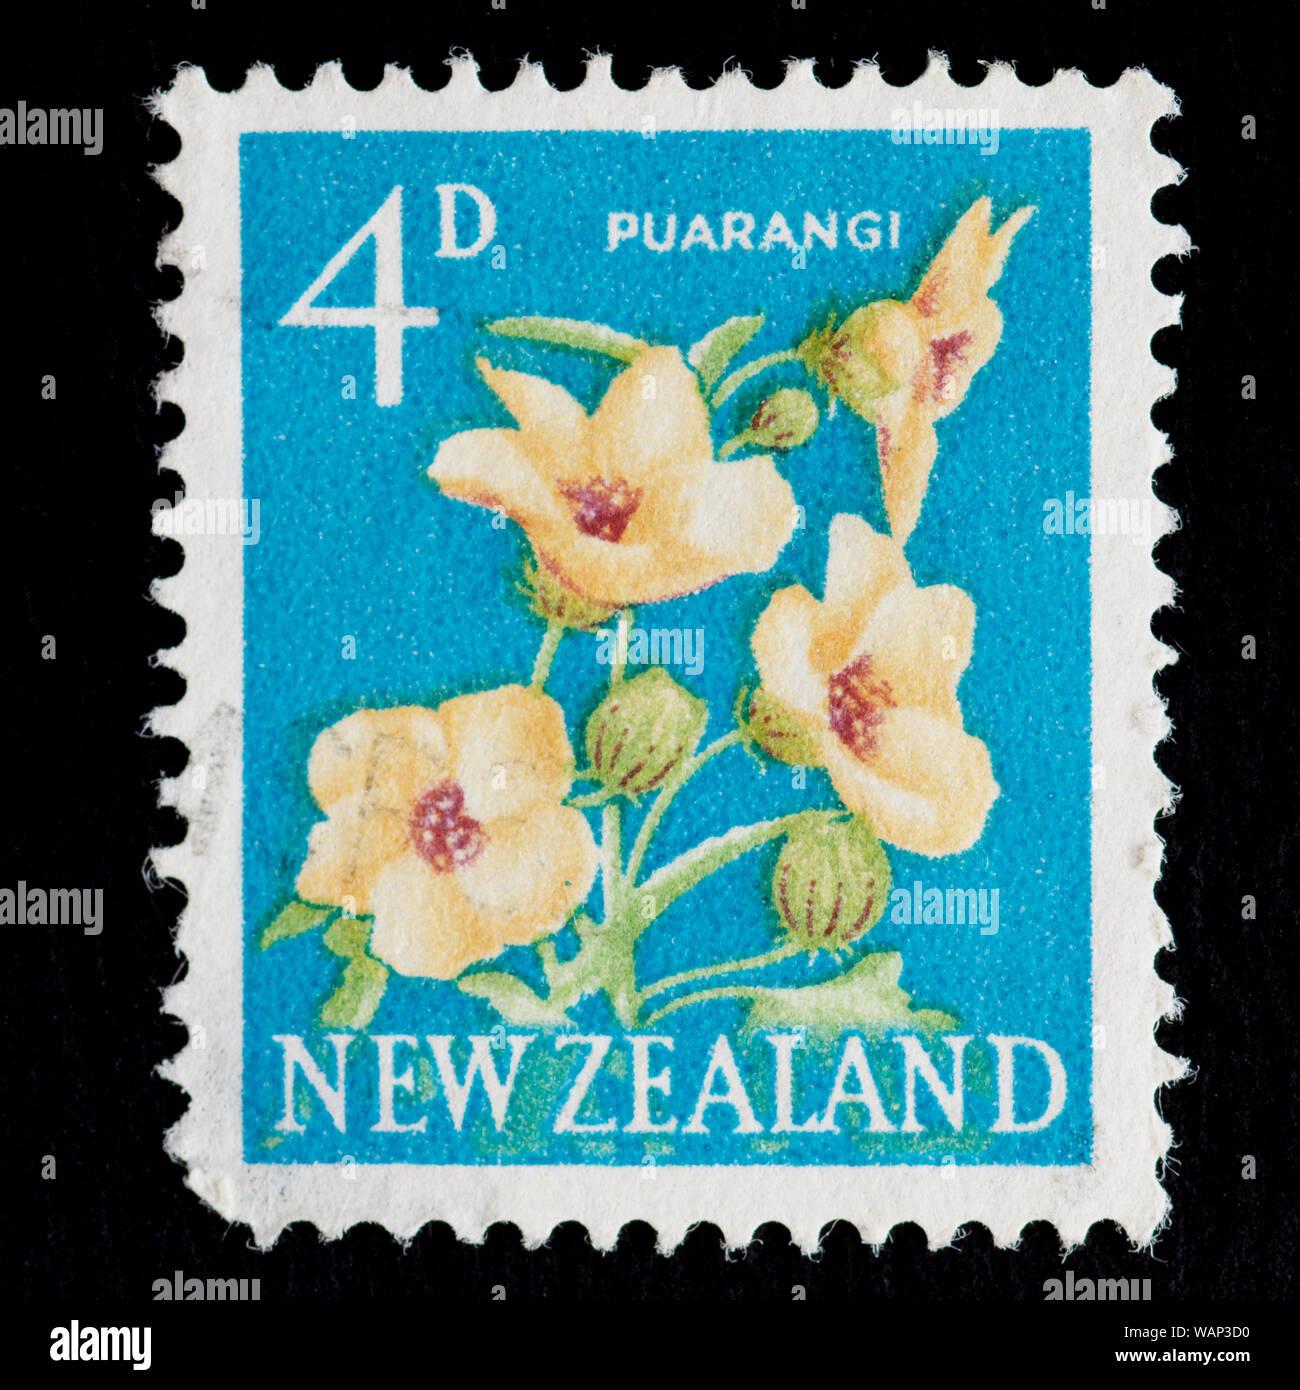 New Zealand Postage Stamp - Puarangi, Venice Mallow (Hibiscus trionum) Stock Photo